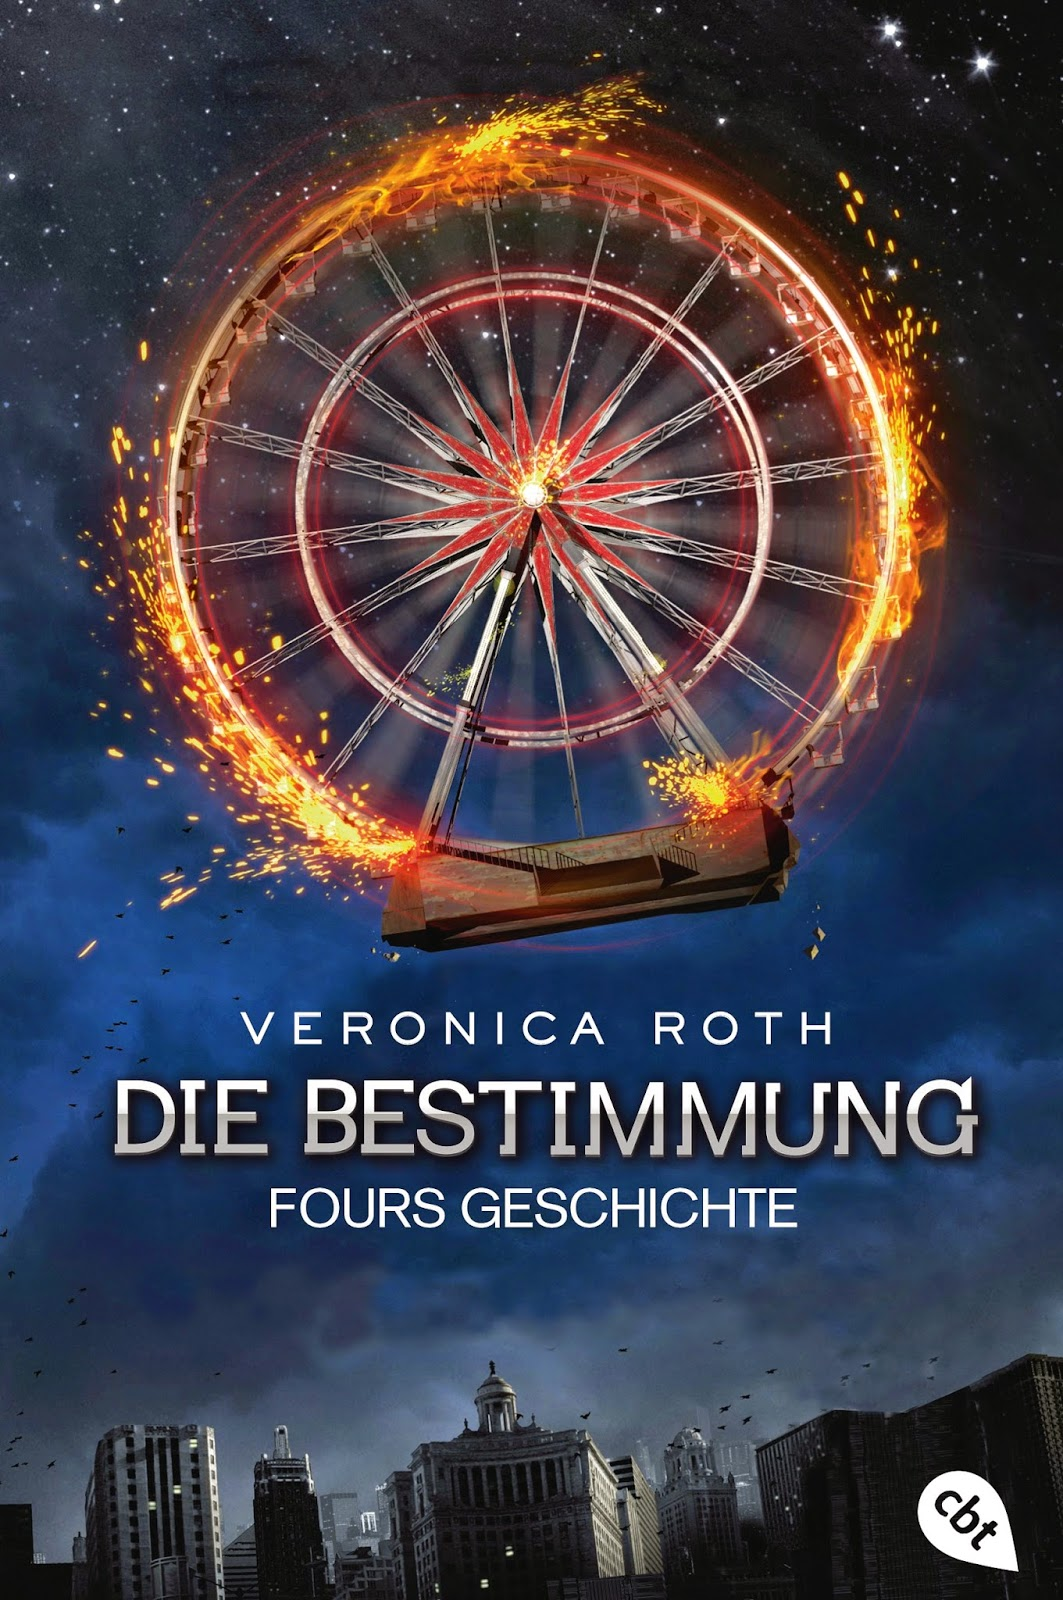 http://www.randomhouse.de/content/edition/covervoila_hires/Roth_VDie_Bestimmung_Fours_Geschichte__148246.jpg